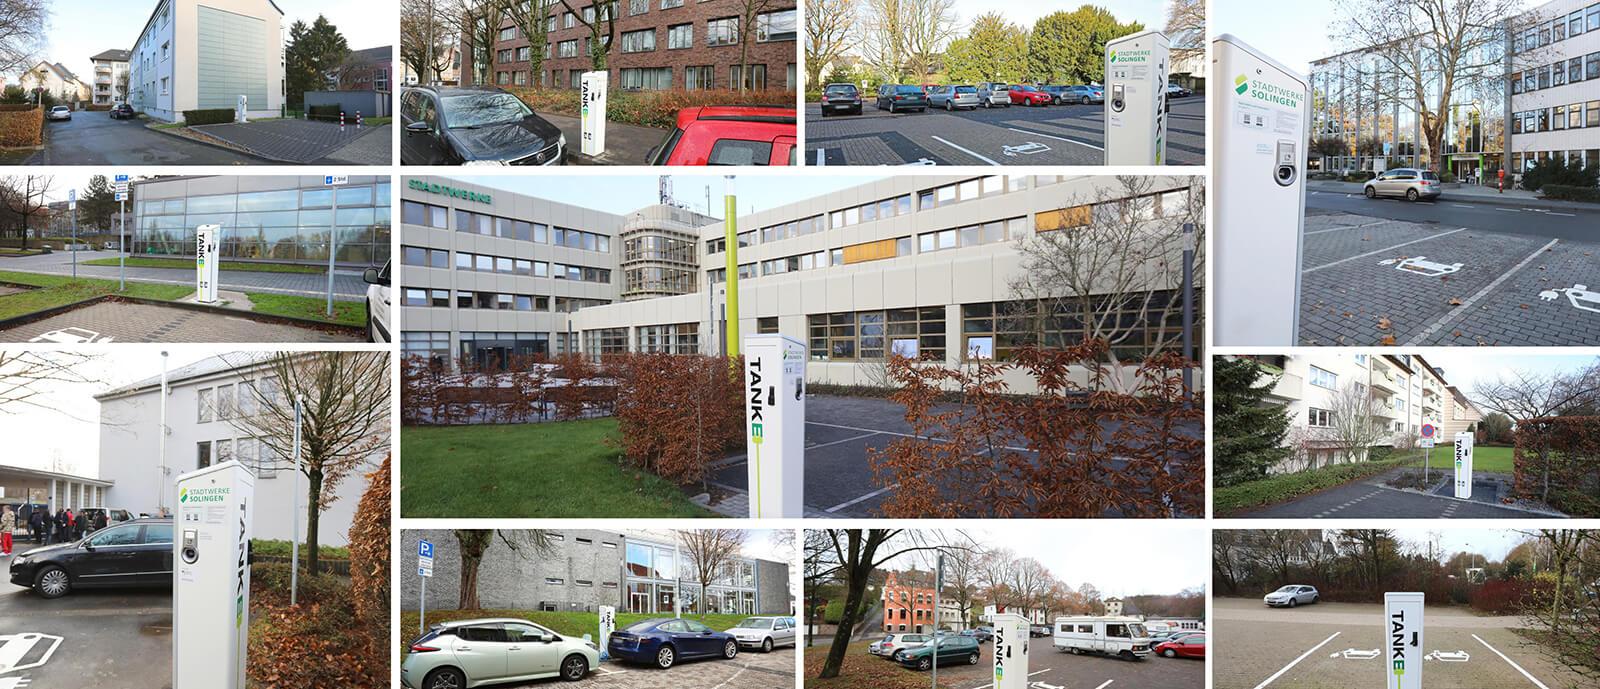 Ladesäulen in Solingen (Collage, Stand: Dezember 2018)